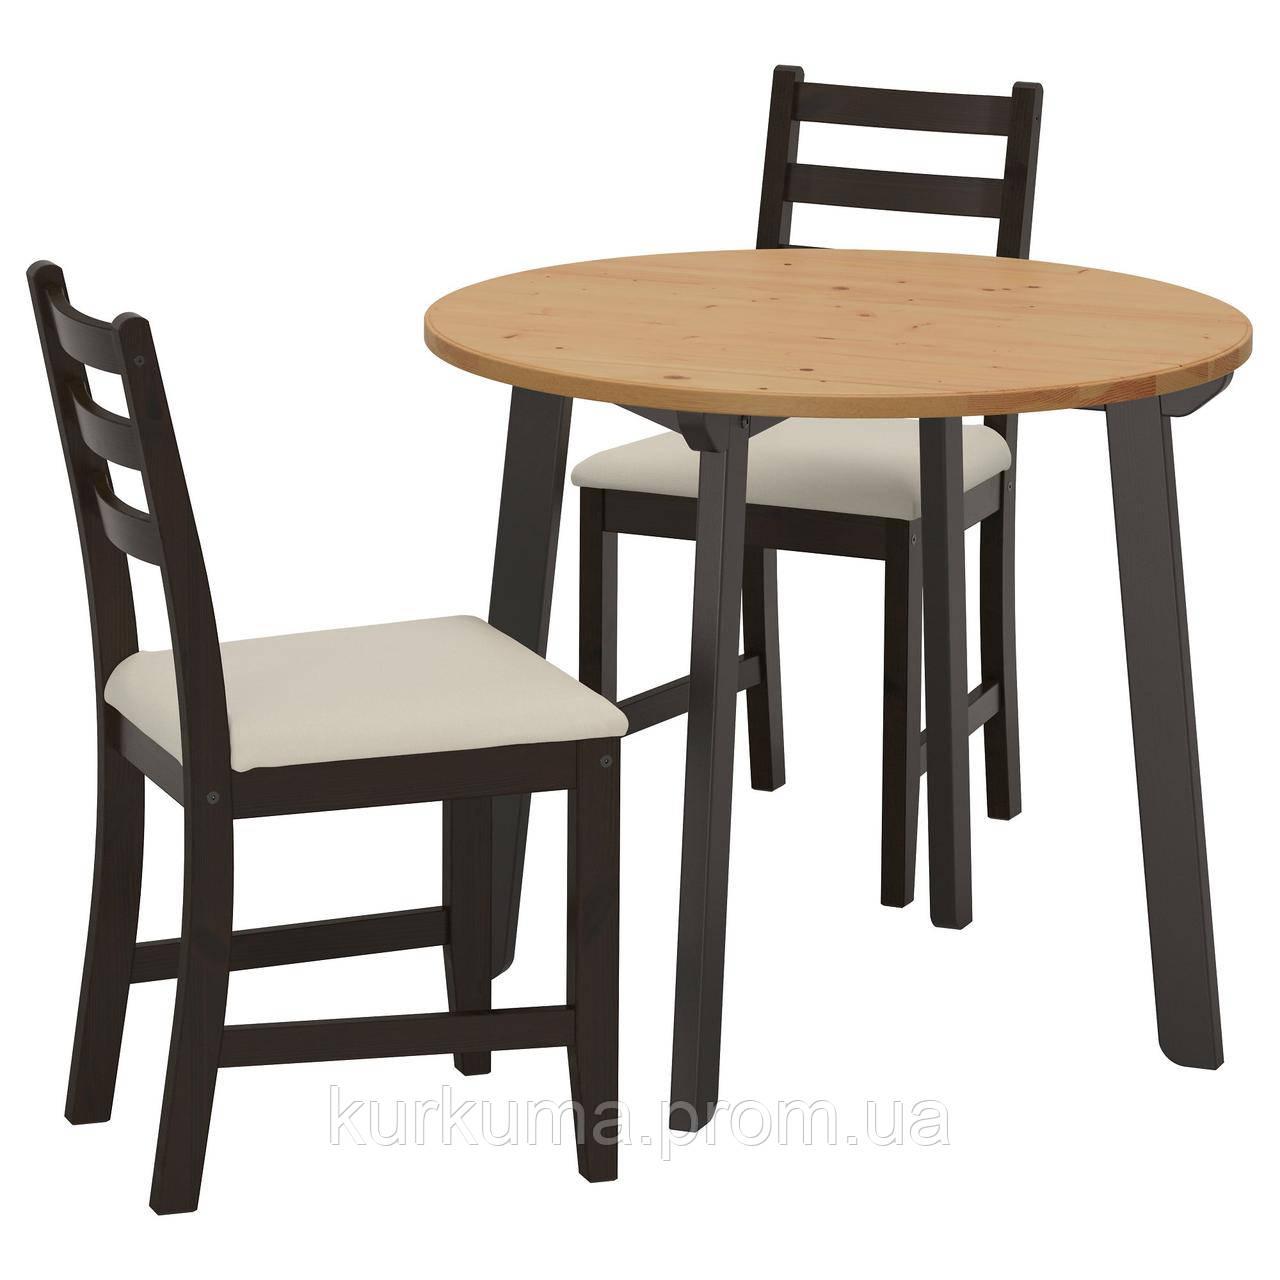 IKEA GAMLARED/LERHAMN Стол и 2 стула, светлый патина черно-коричневый, Vittaryd (792.211.69)